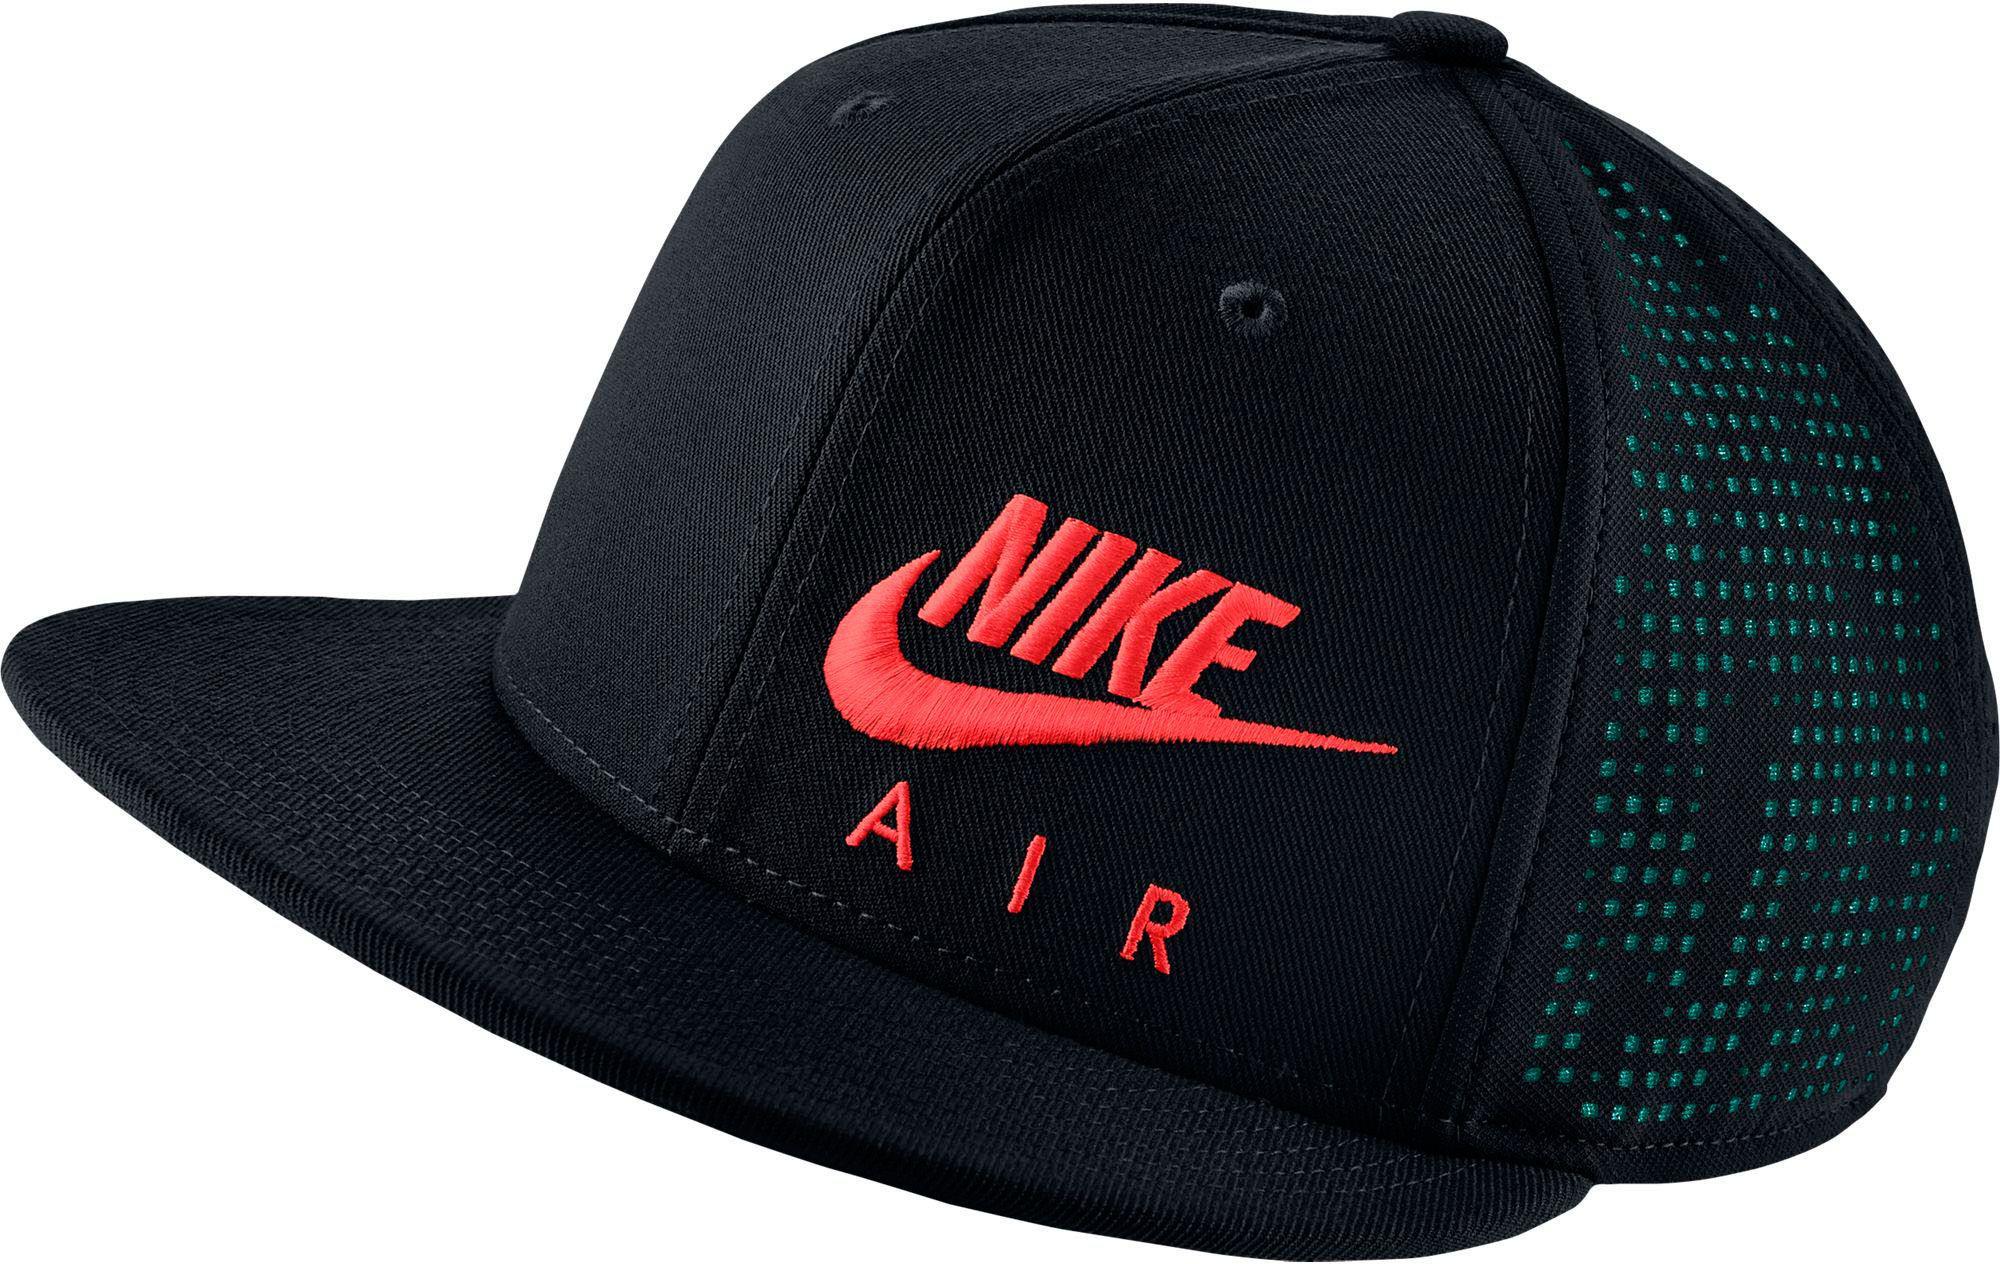 b4812aa8310 ... usa lyst nike air hybrid true adjustable snapback hat in black for men  22899 e2101